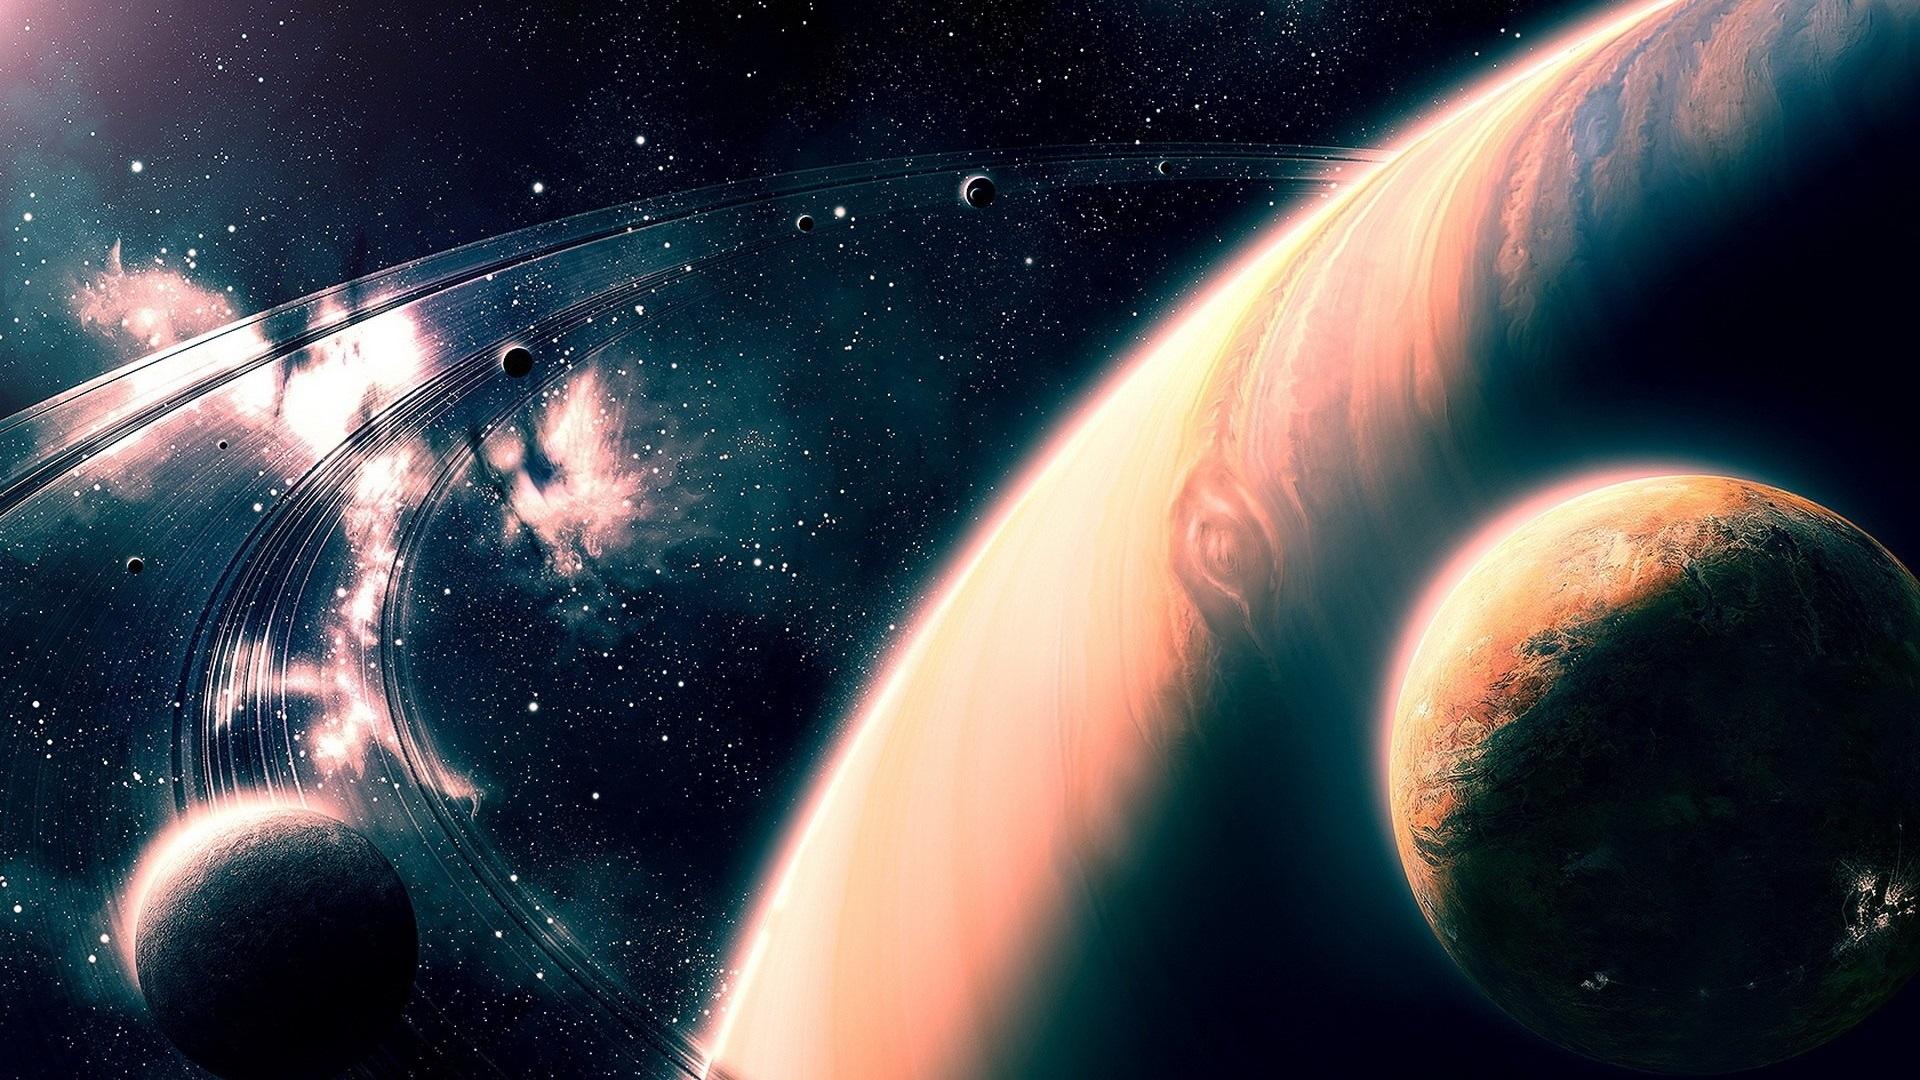 Fondos De Pantalla Hermoso Universo, Planetas, Estrellas